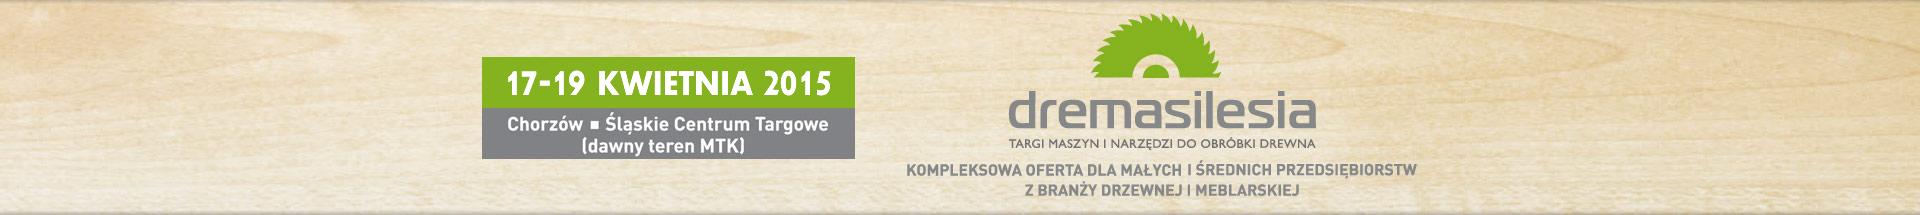 baner Dremasilesia 2015